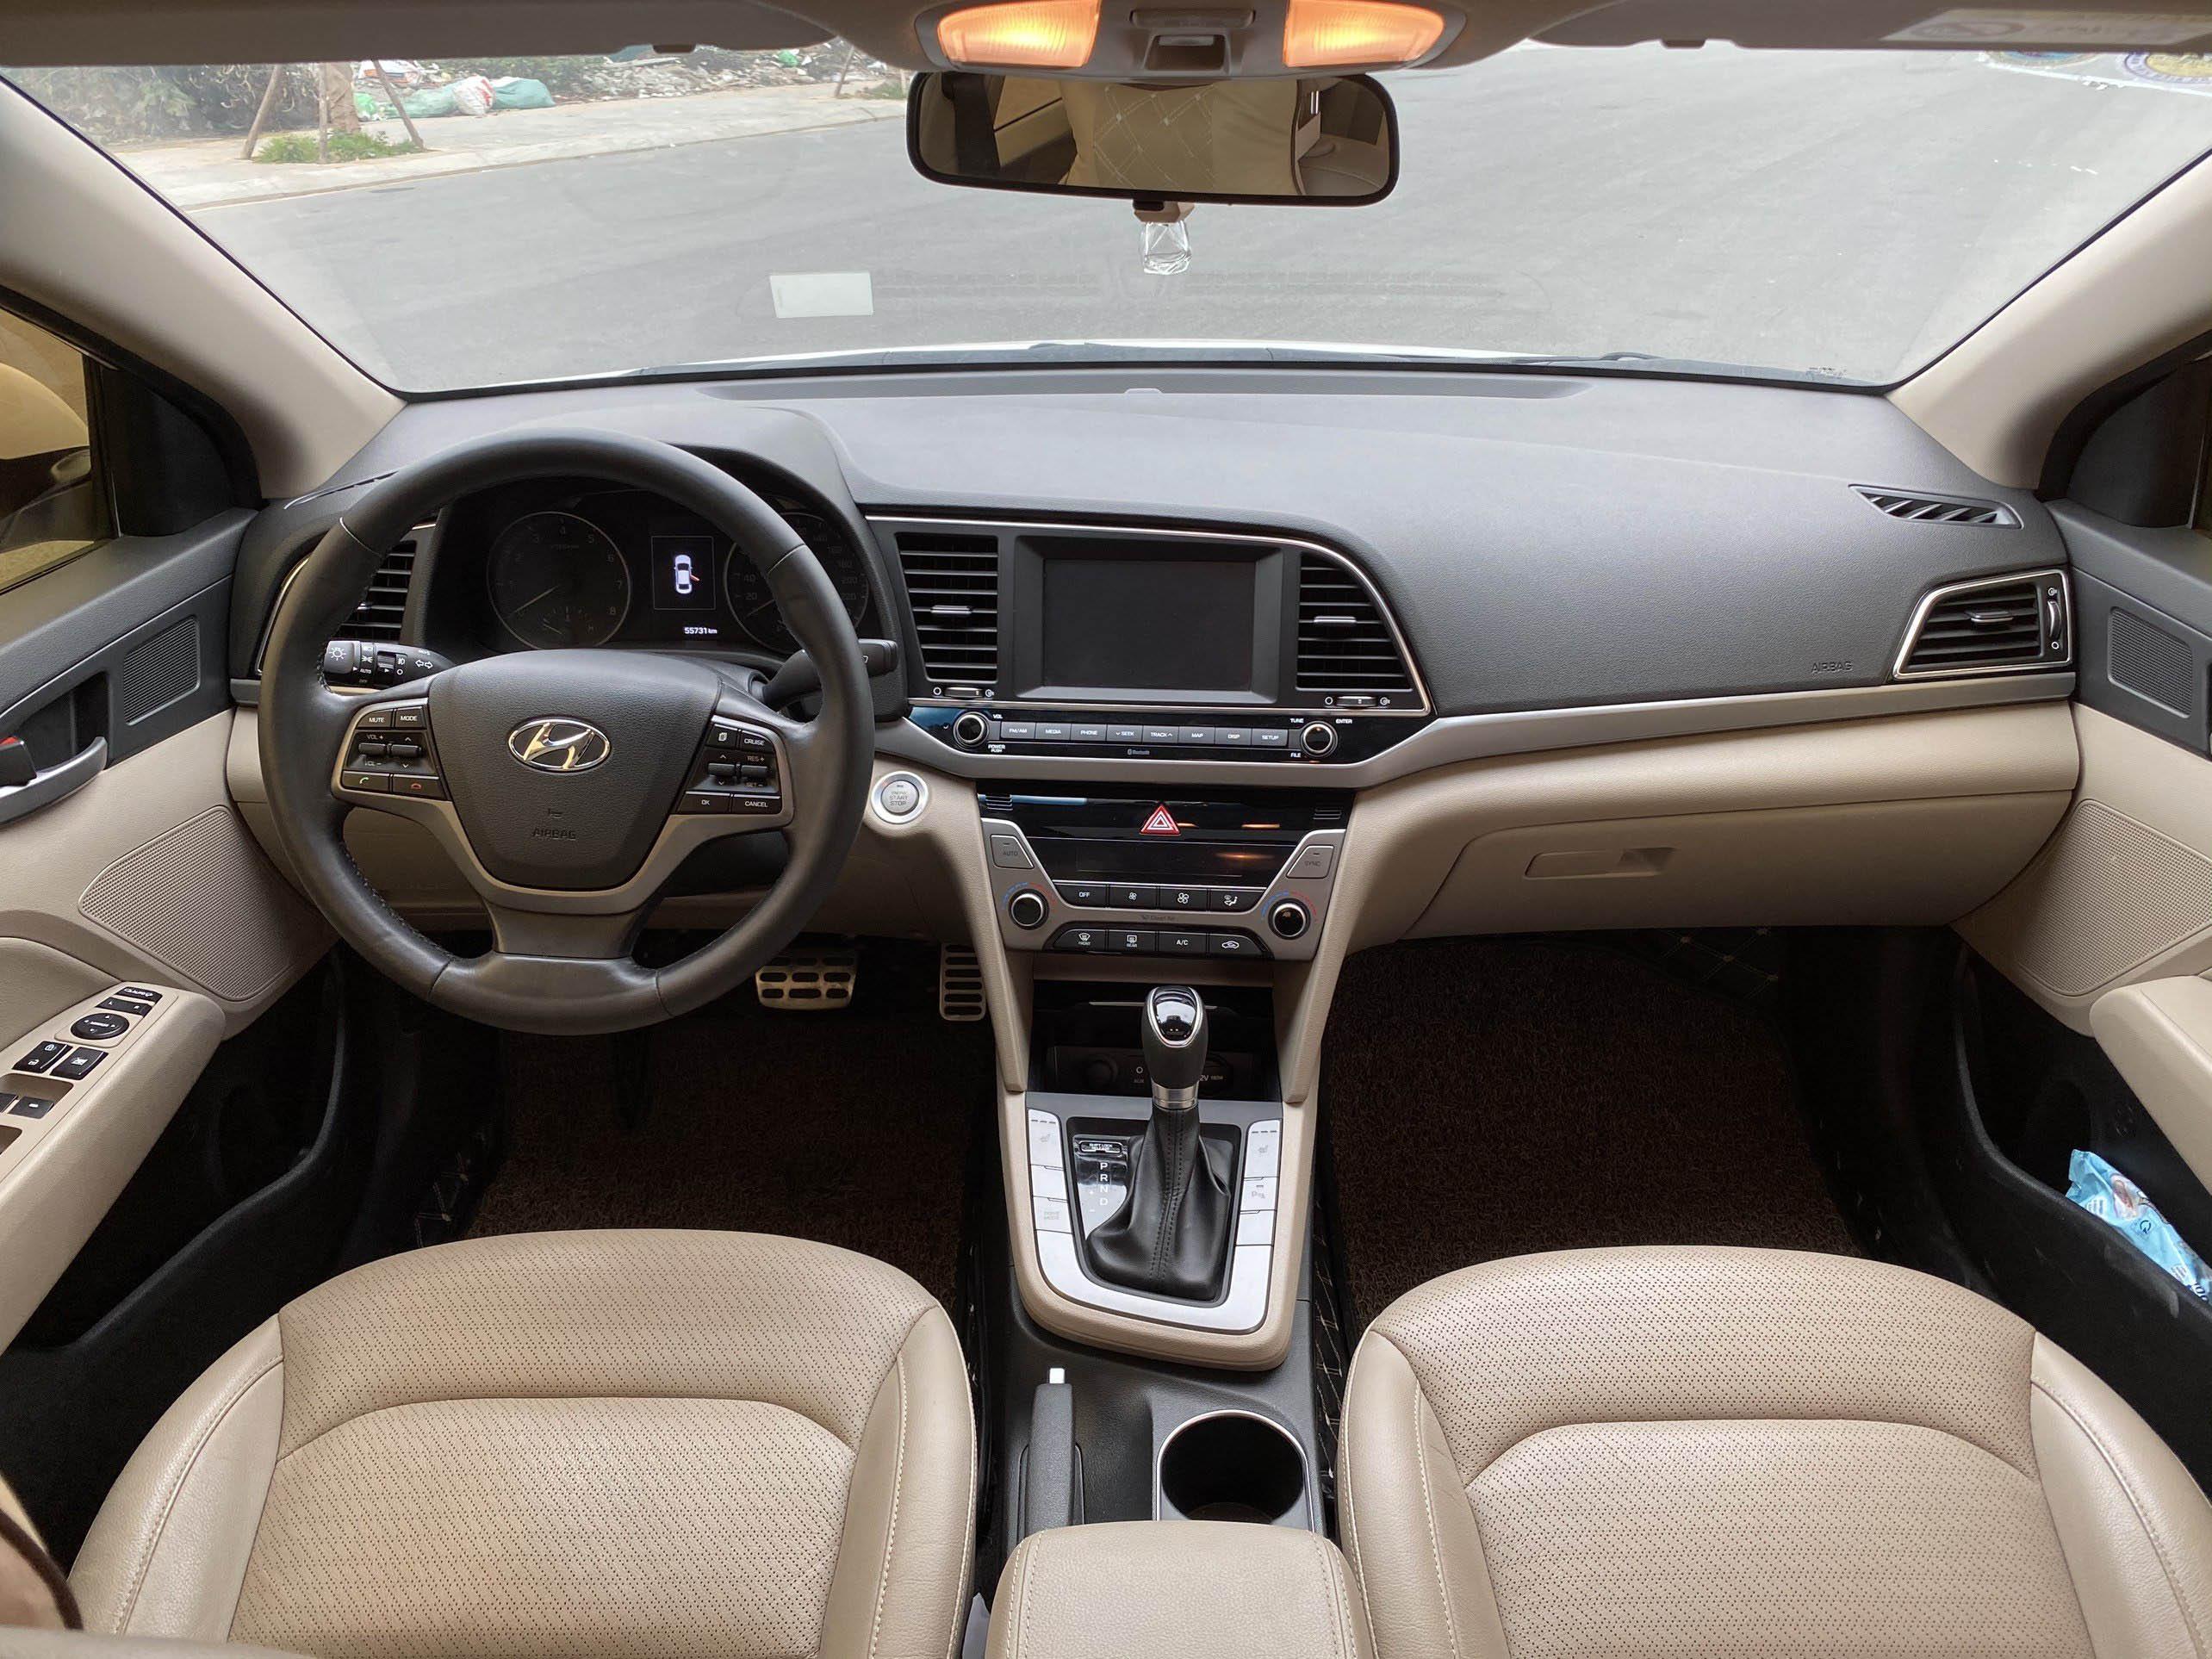 Hyundai Elantra 2.0 GLS 2018